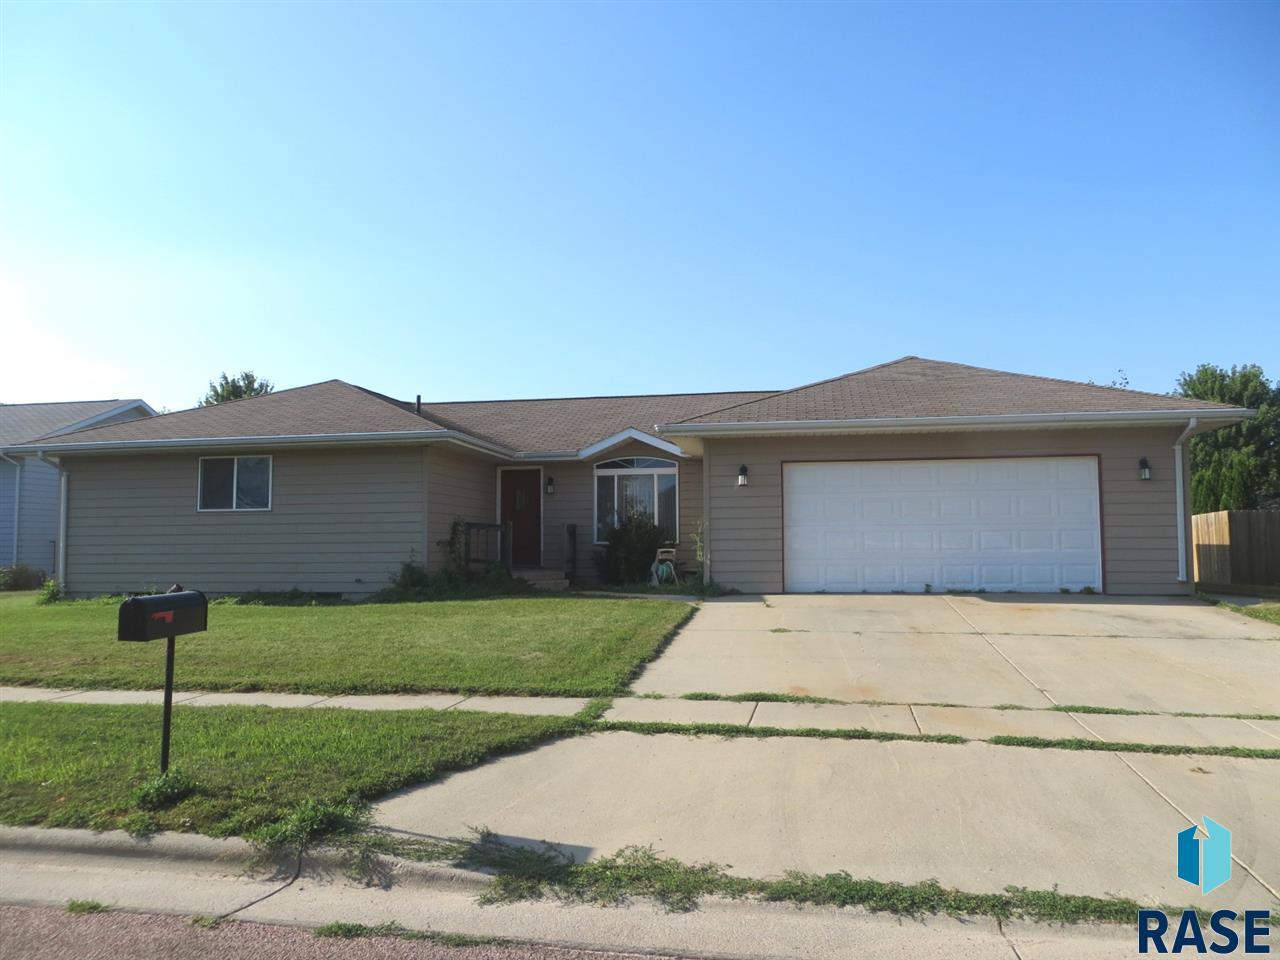 814 W 2nd Ave, Lennox, SD 57039